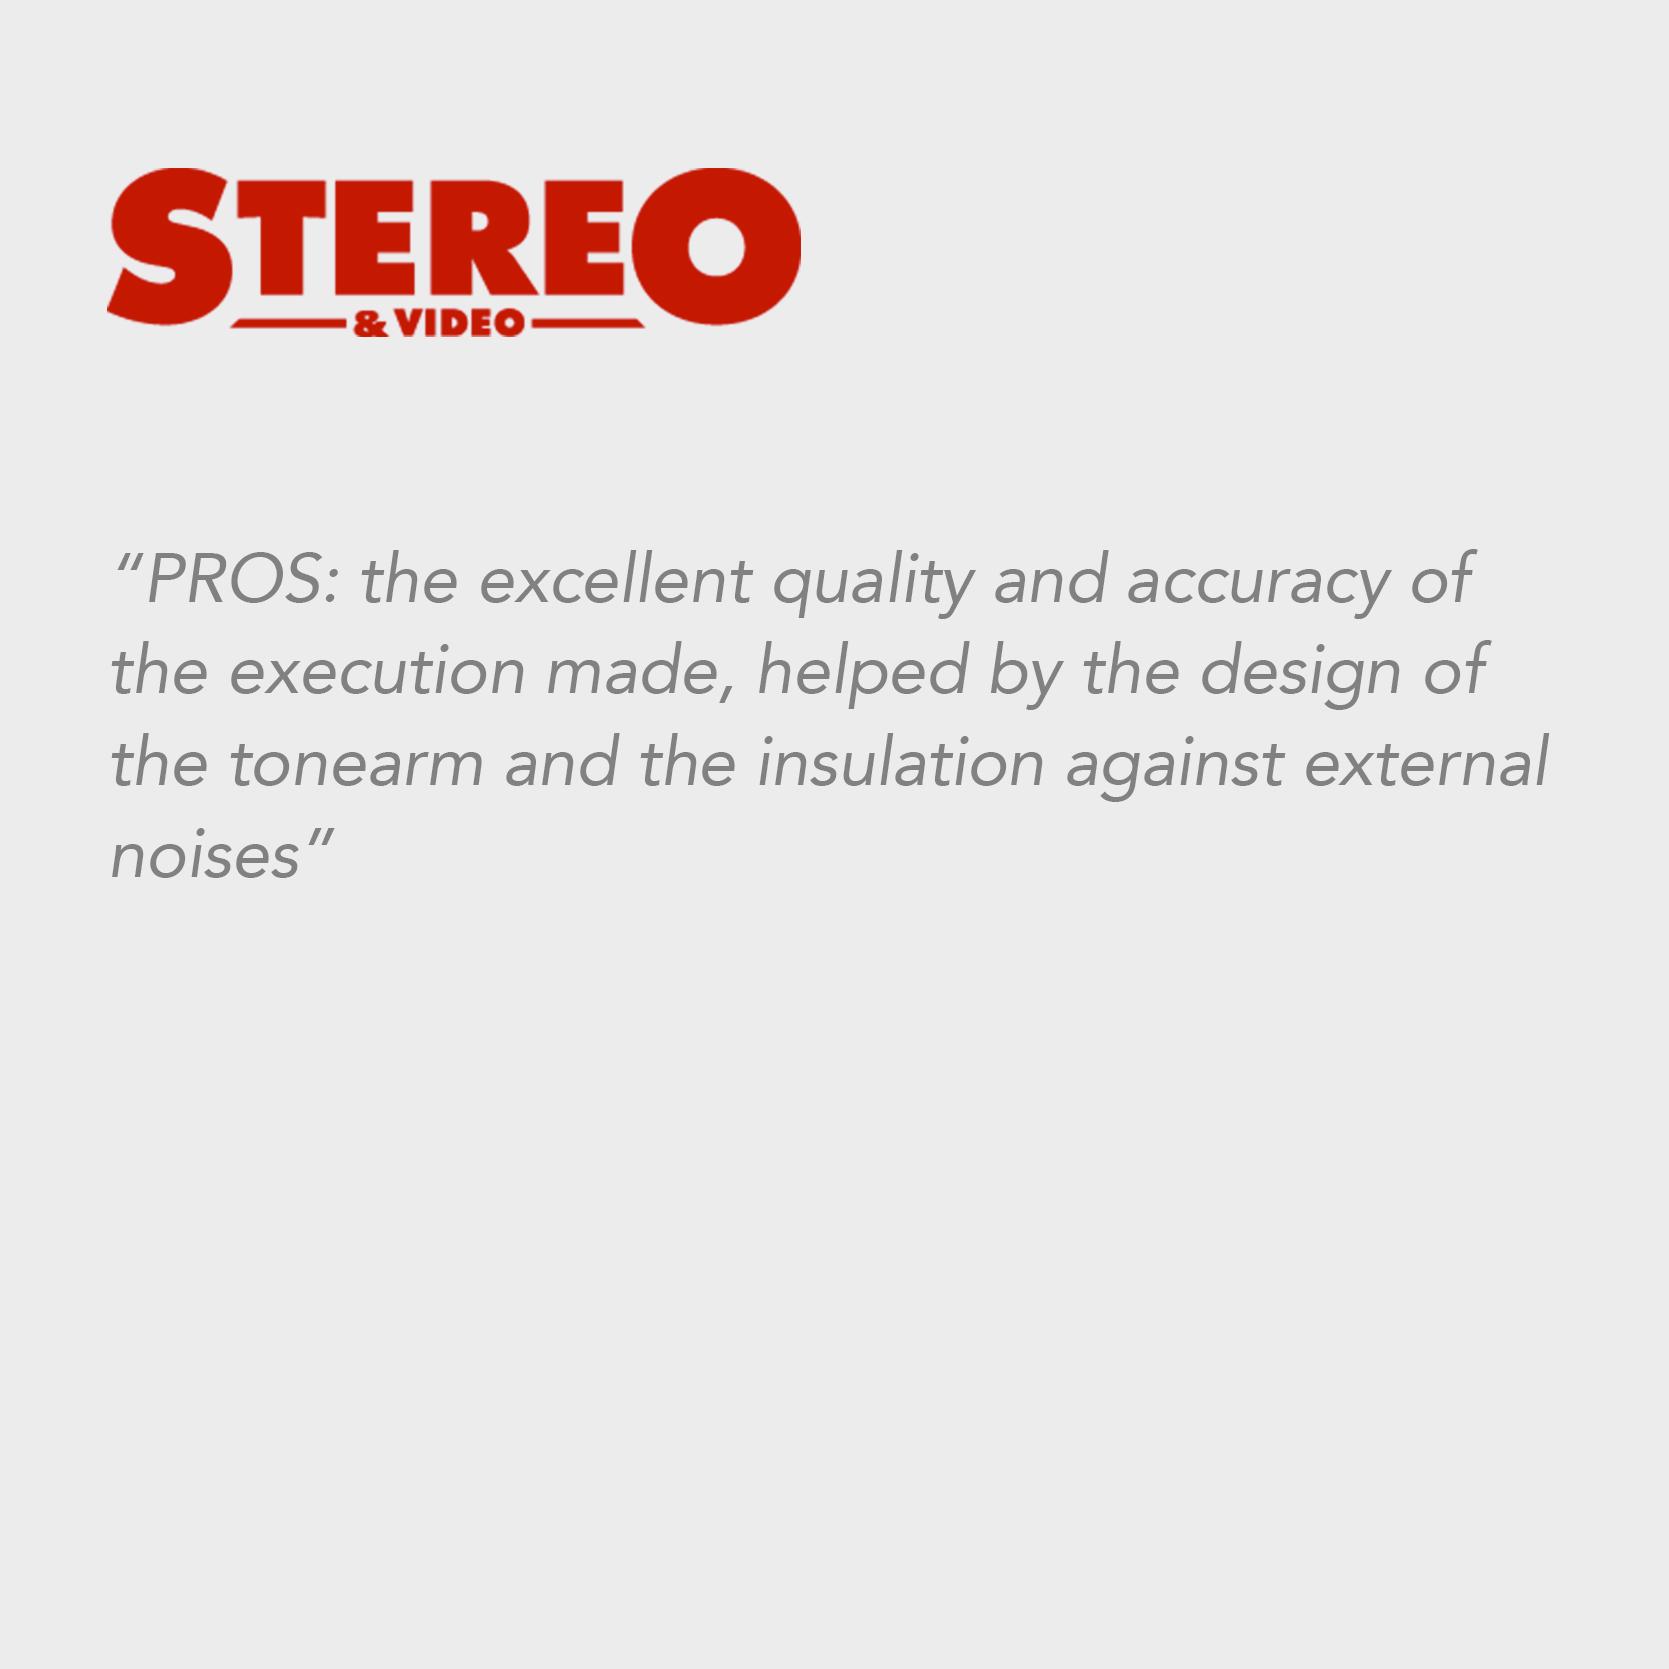 Stereo & Video | Valore 425 Plus